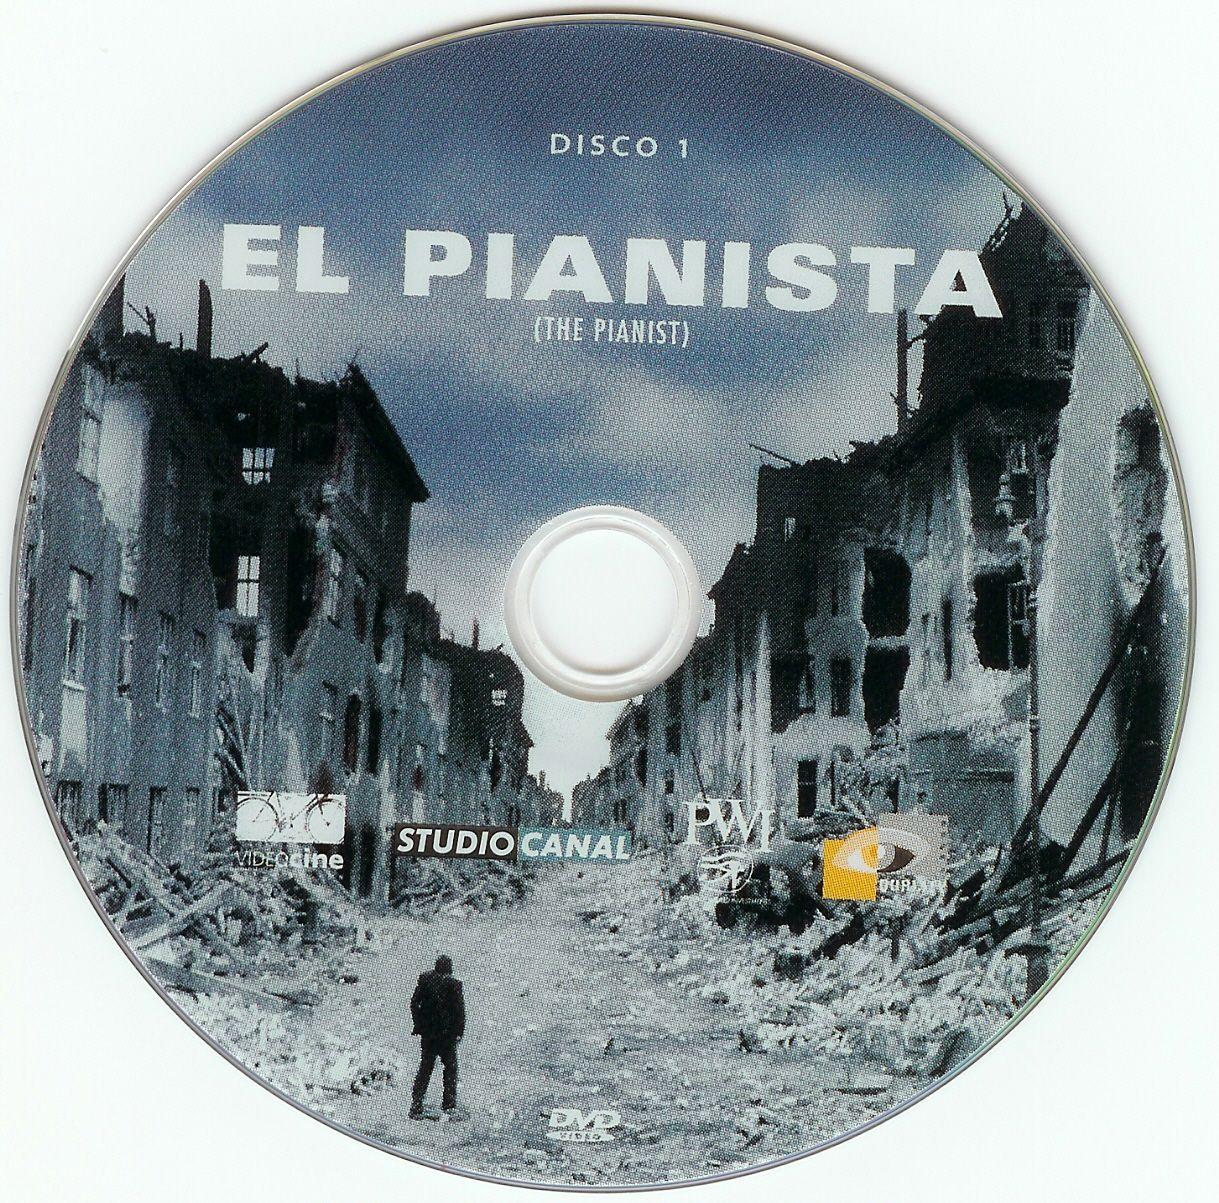 http://4.bp.blogspot.com/_FN7dlH54yBQ/TB8hmBL-ZII/AAAAAAAADNo/AhSXk5diav4/s1600/El+Pianista+Disco+1.jpg